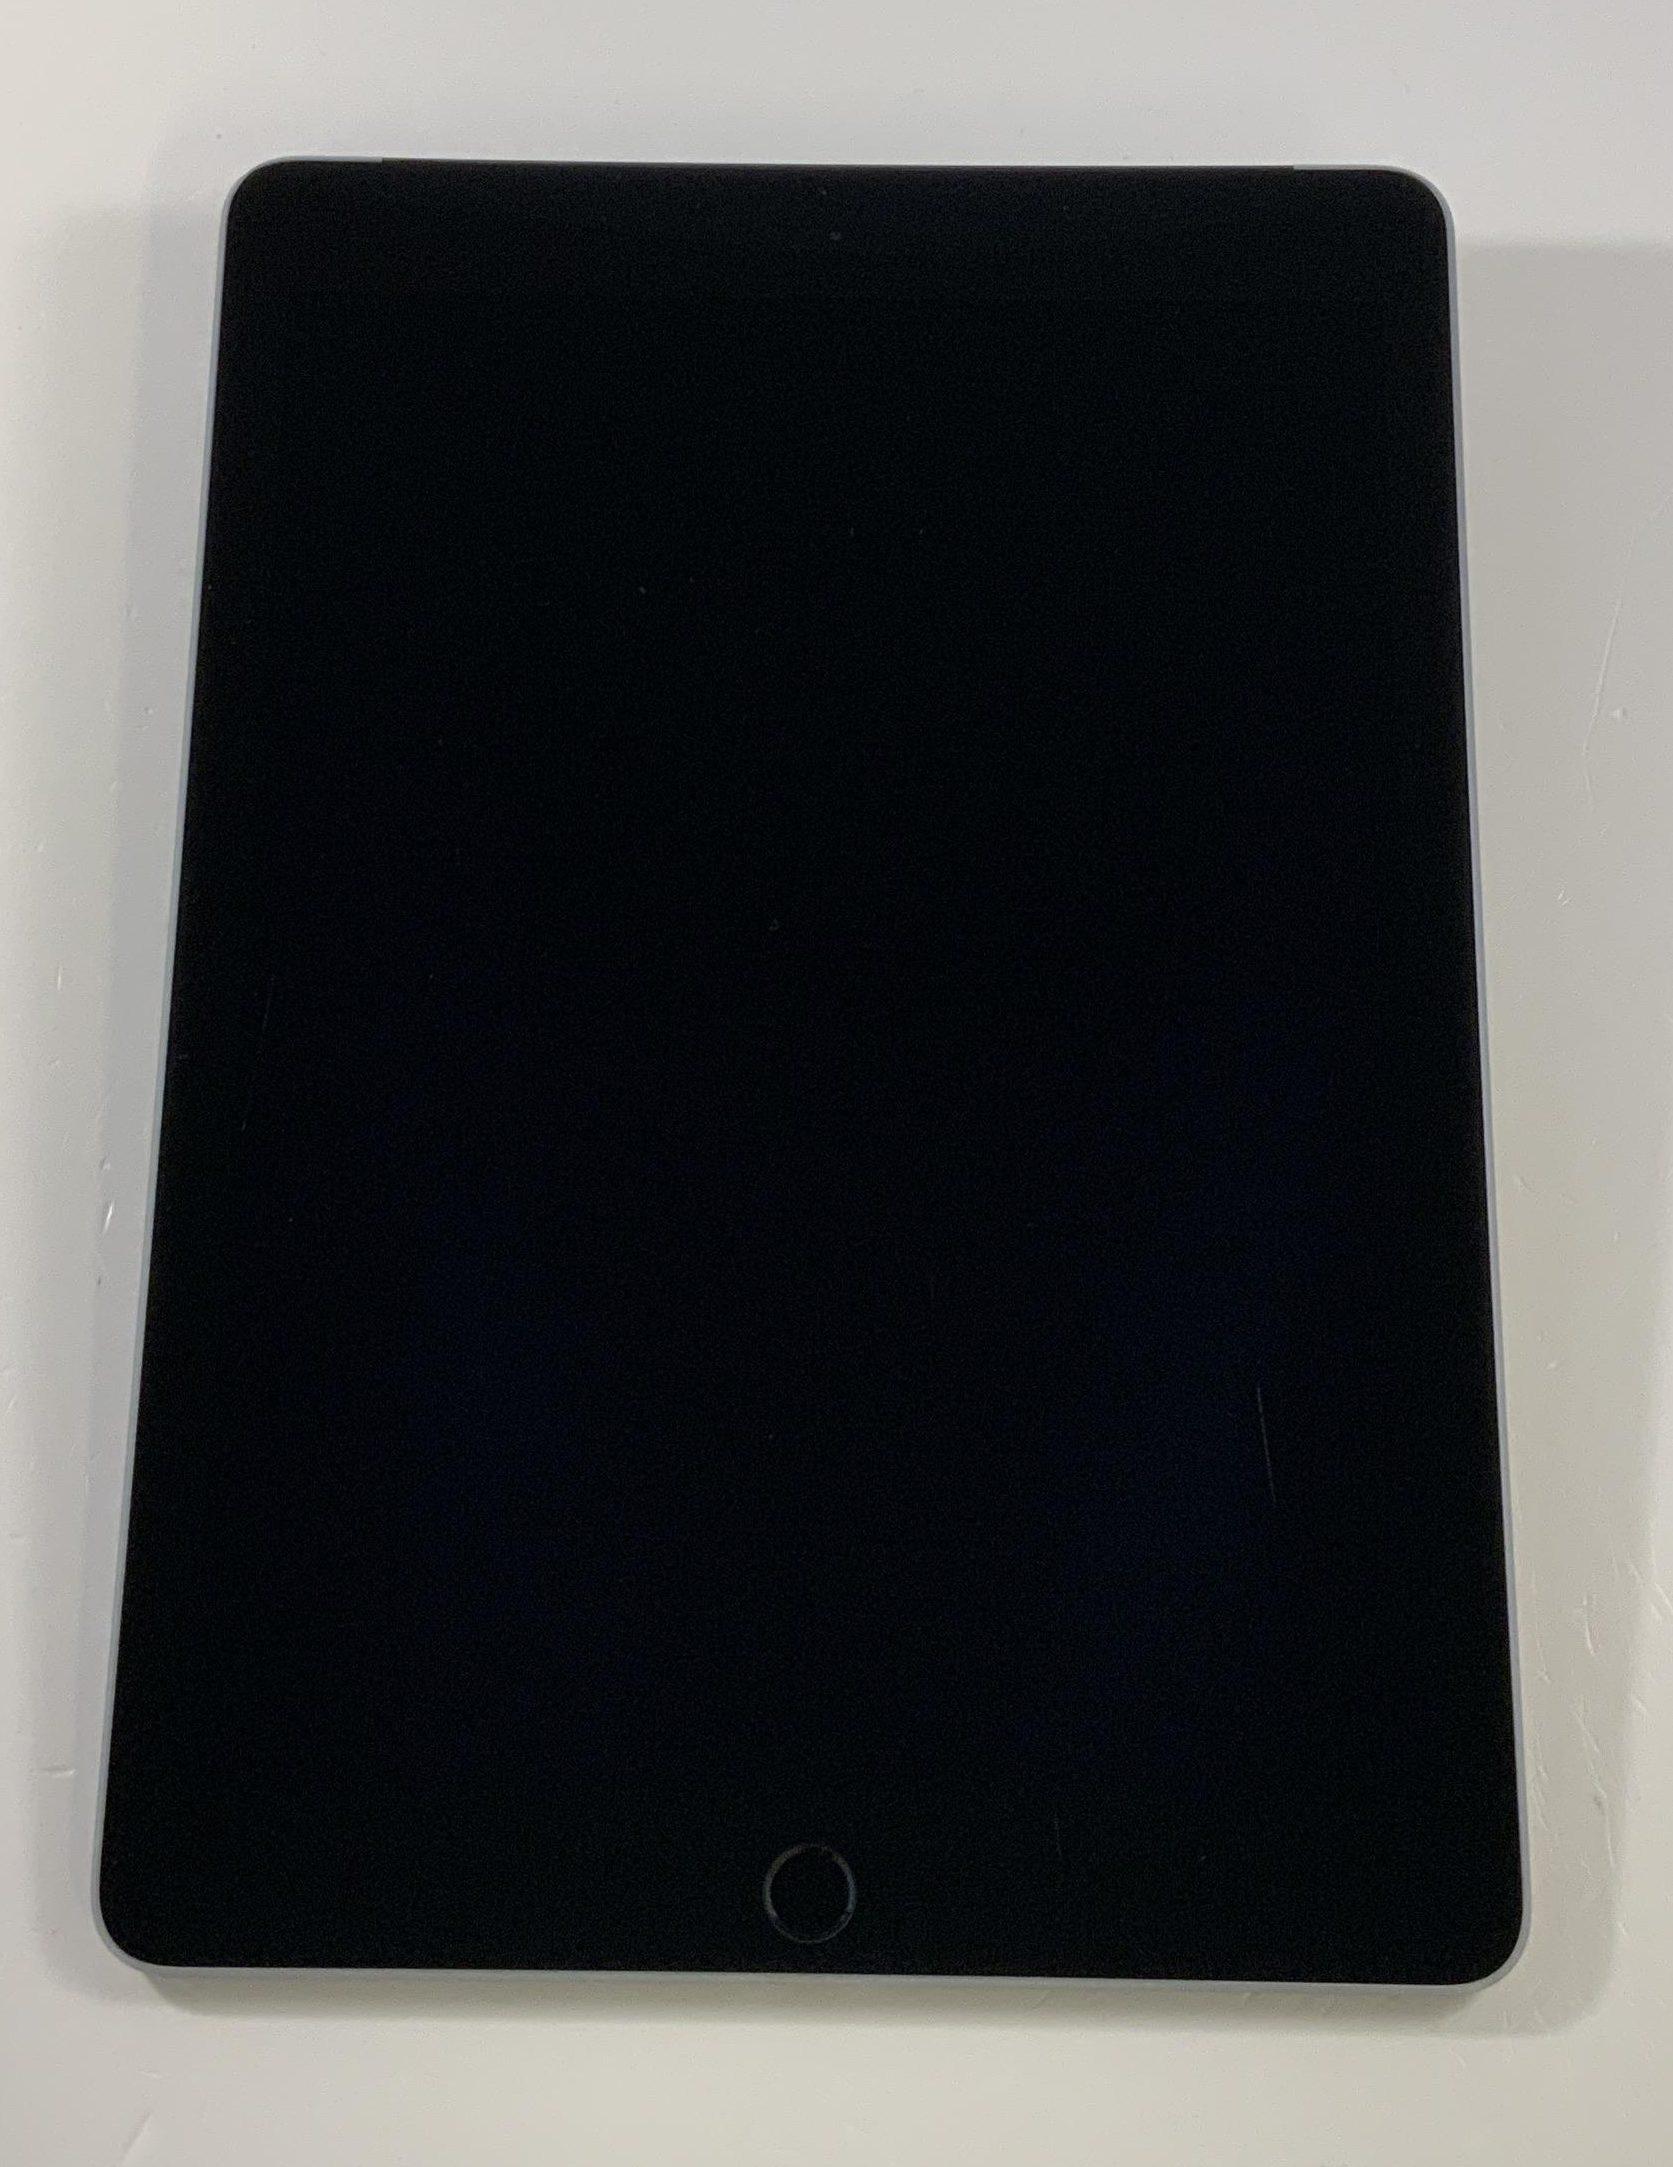 iPad Air 2 Wi-Fi + Cellular 64GB, 64GB, Space Gray, immagine 1